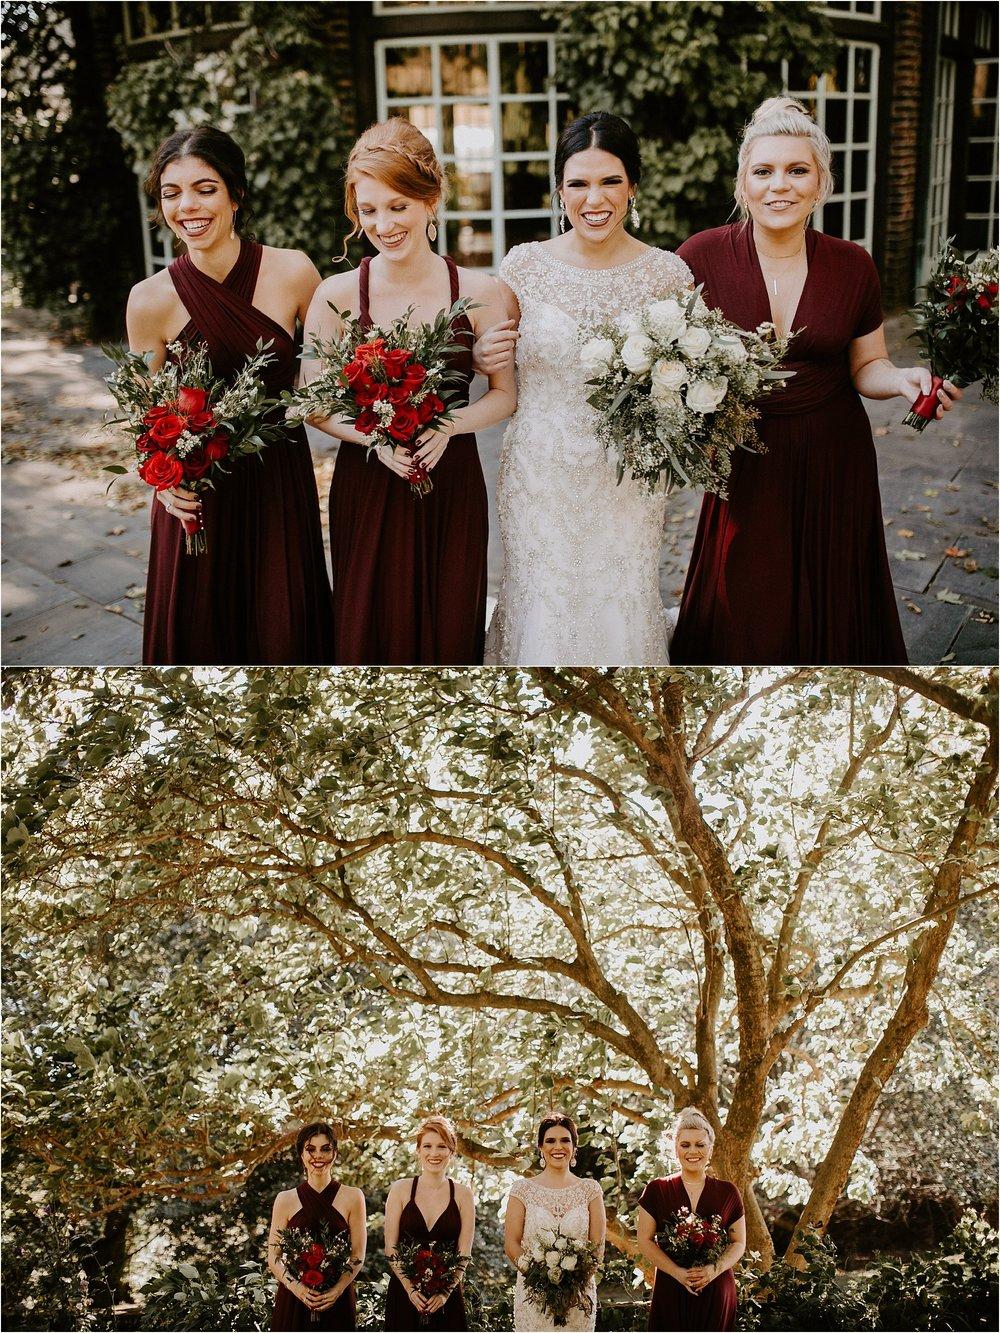 Sarah_Brookhart_Philadelphia_Wedding_Photographer_0018.jpg